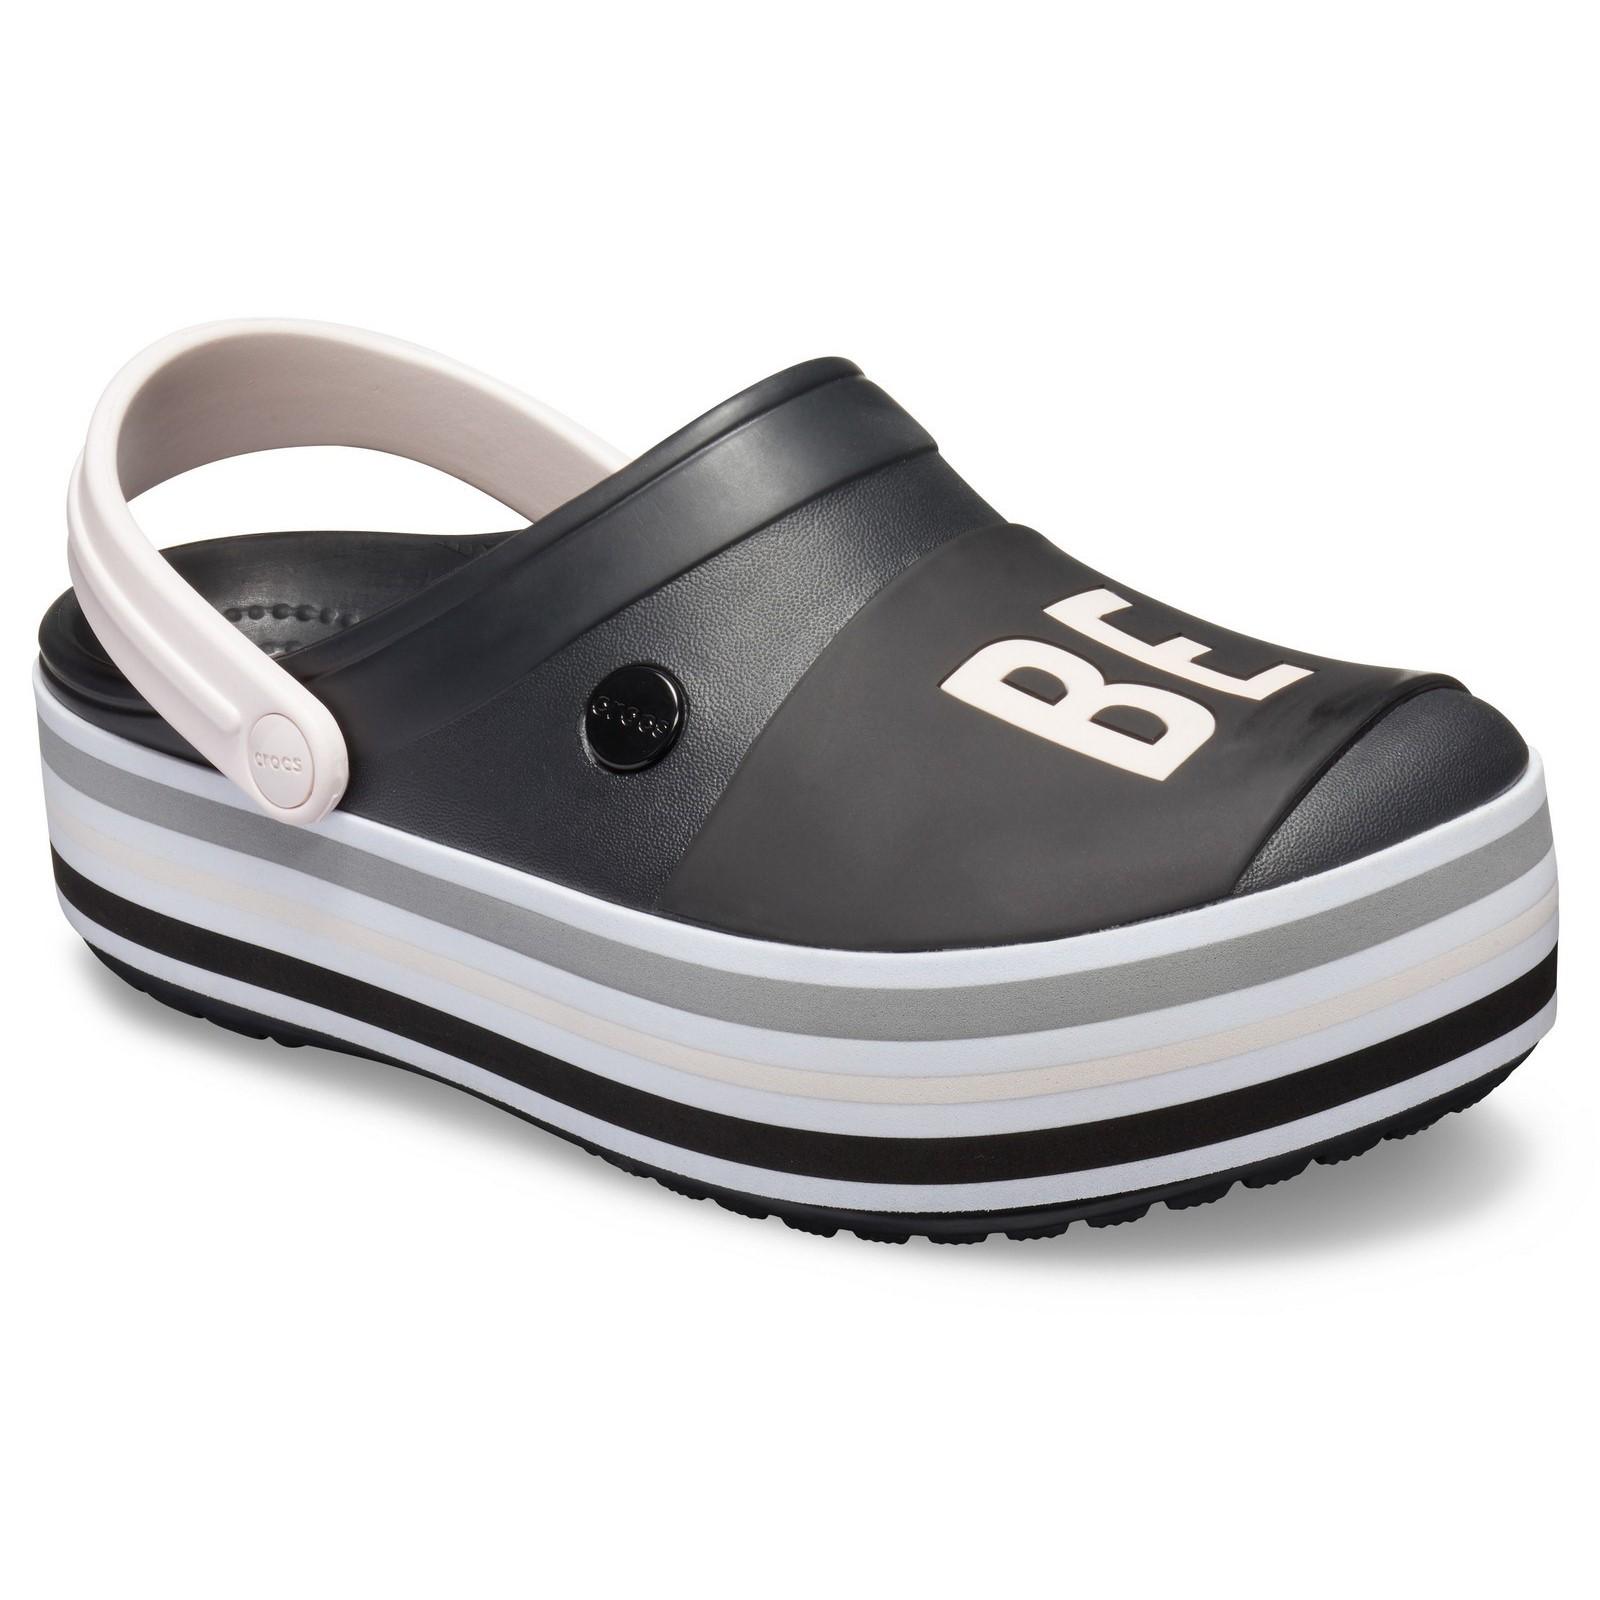 9c24032efbb Image is loading Crocs-Womens-Crocband-Platform-Clog-Slip-On